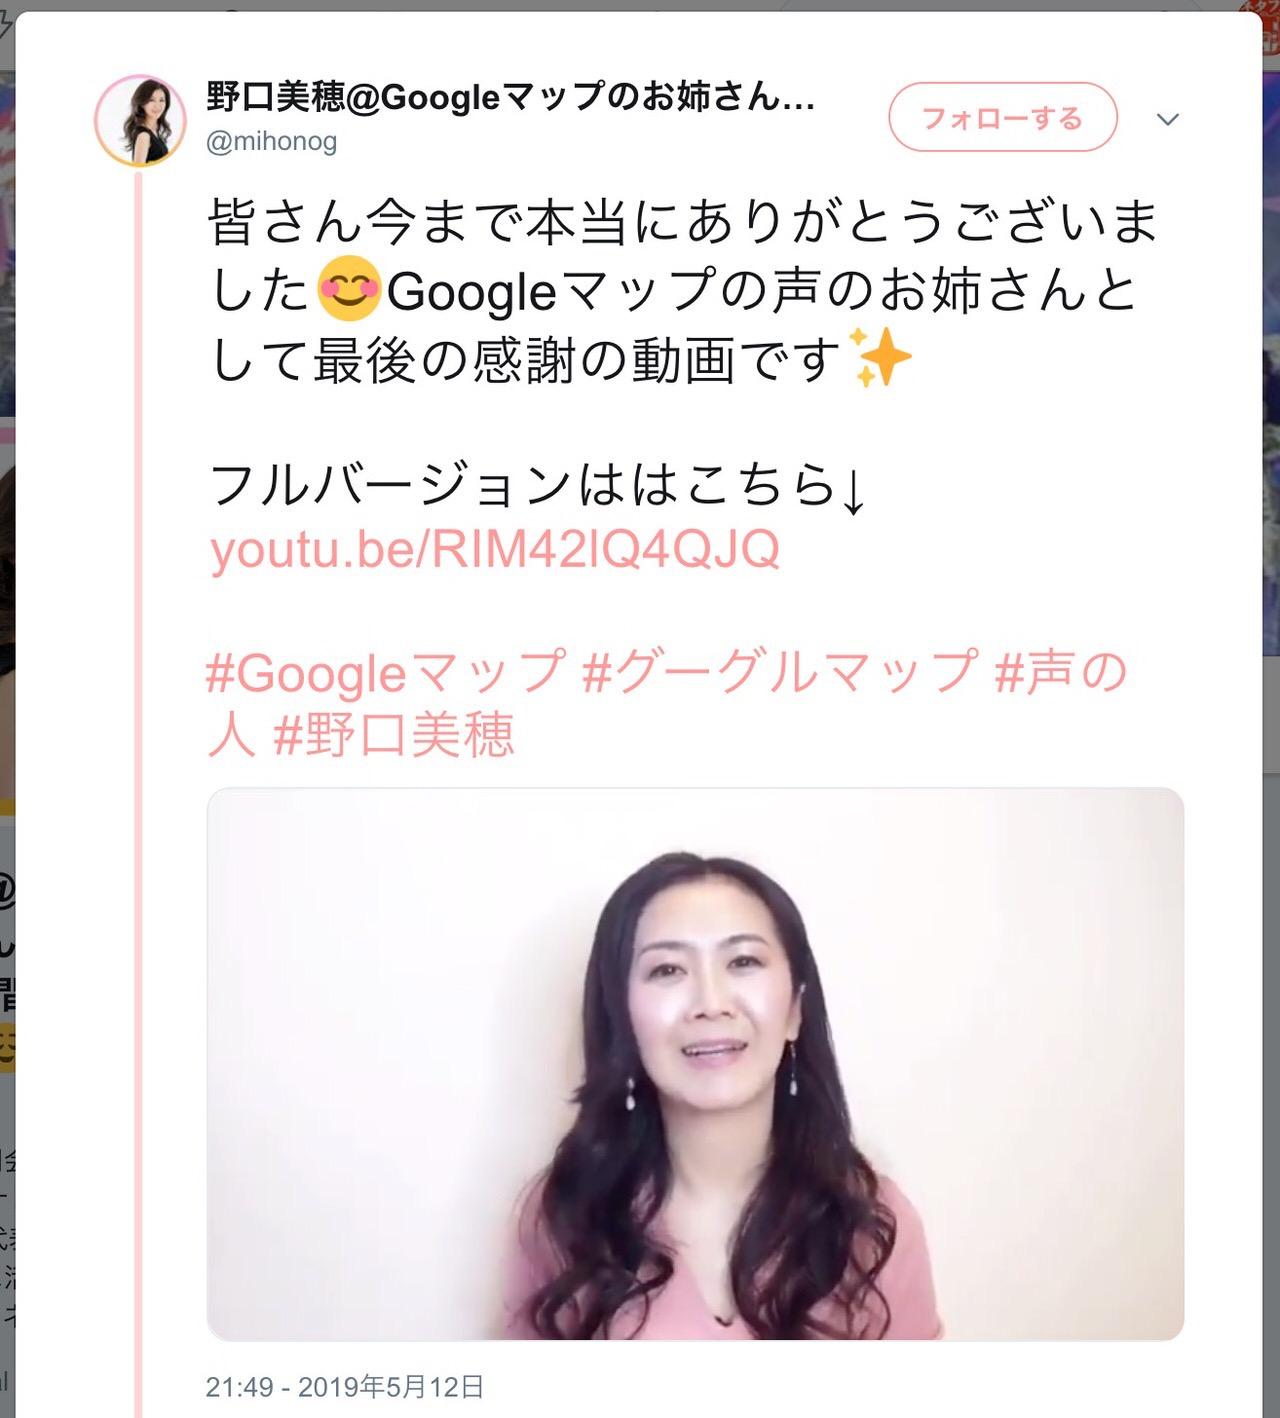 Googleマップの声のお姉さん・野口美穂さんが終了に伴い感謝のメッセージ